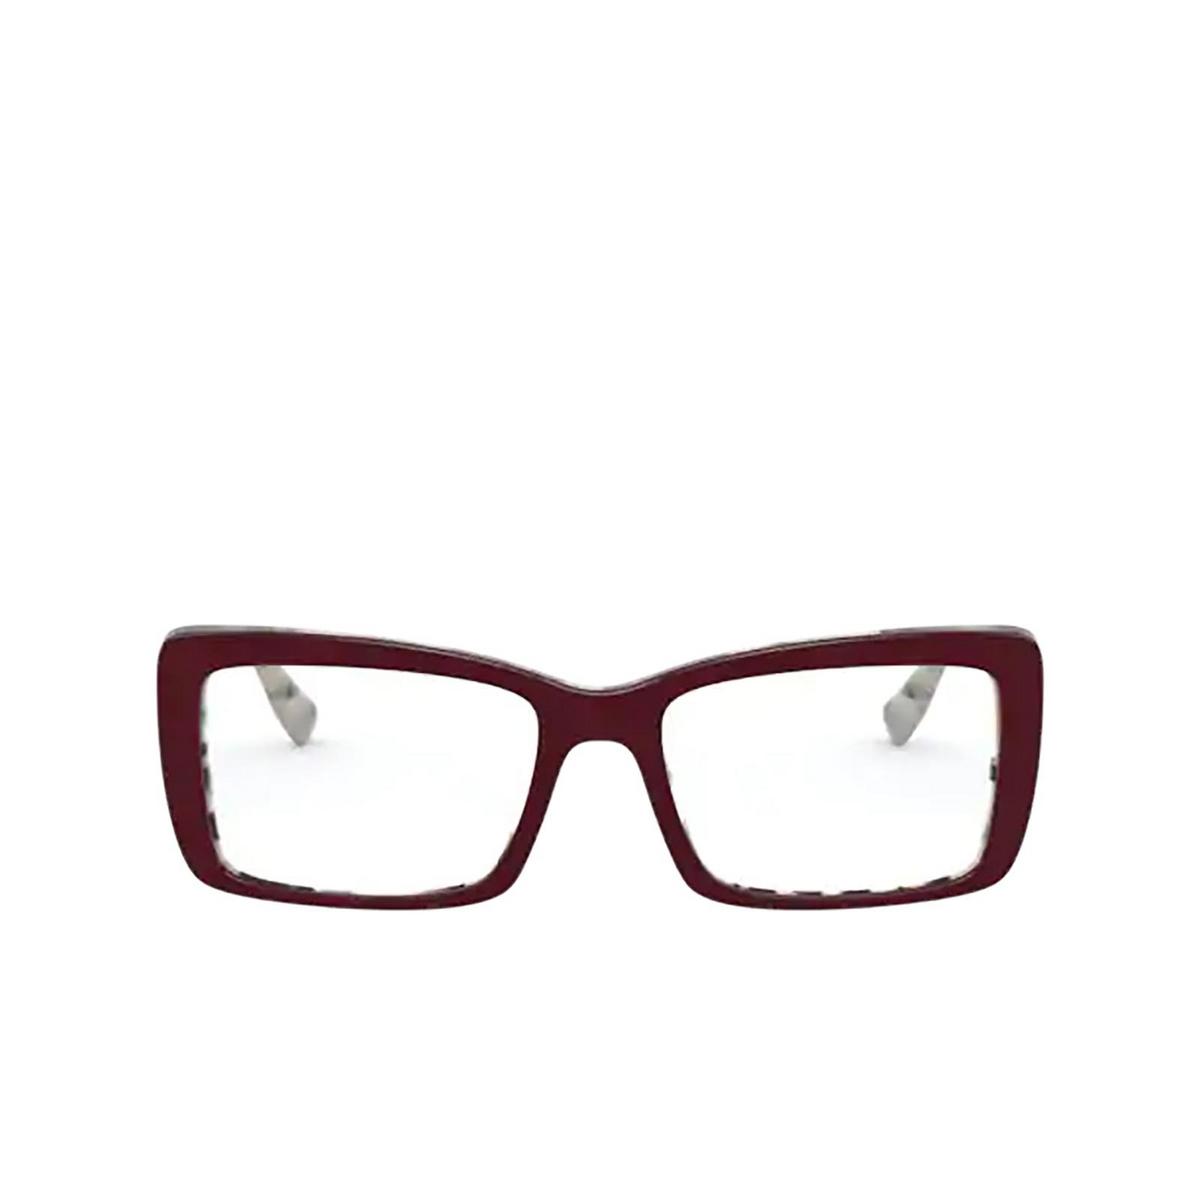 Miu Miu® Rectangle Eyeglasses: MU 03SV color Beige Havana Top Bordeaux 03E1O1 - front view.